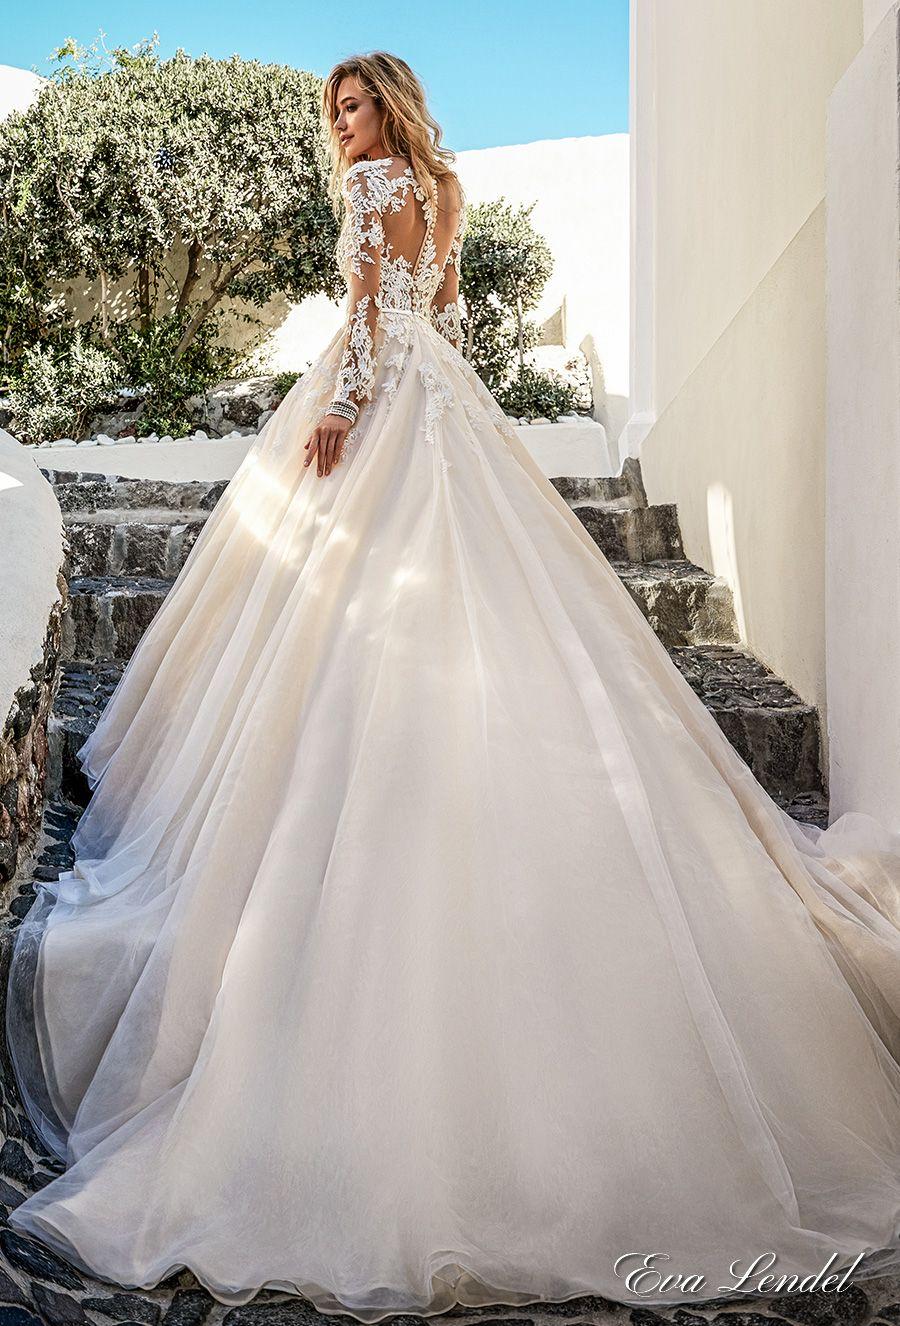 Eva lendel 2017 wedding dresses santorini bridal for Long sleeve princess wedding dresses